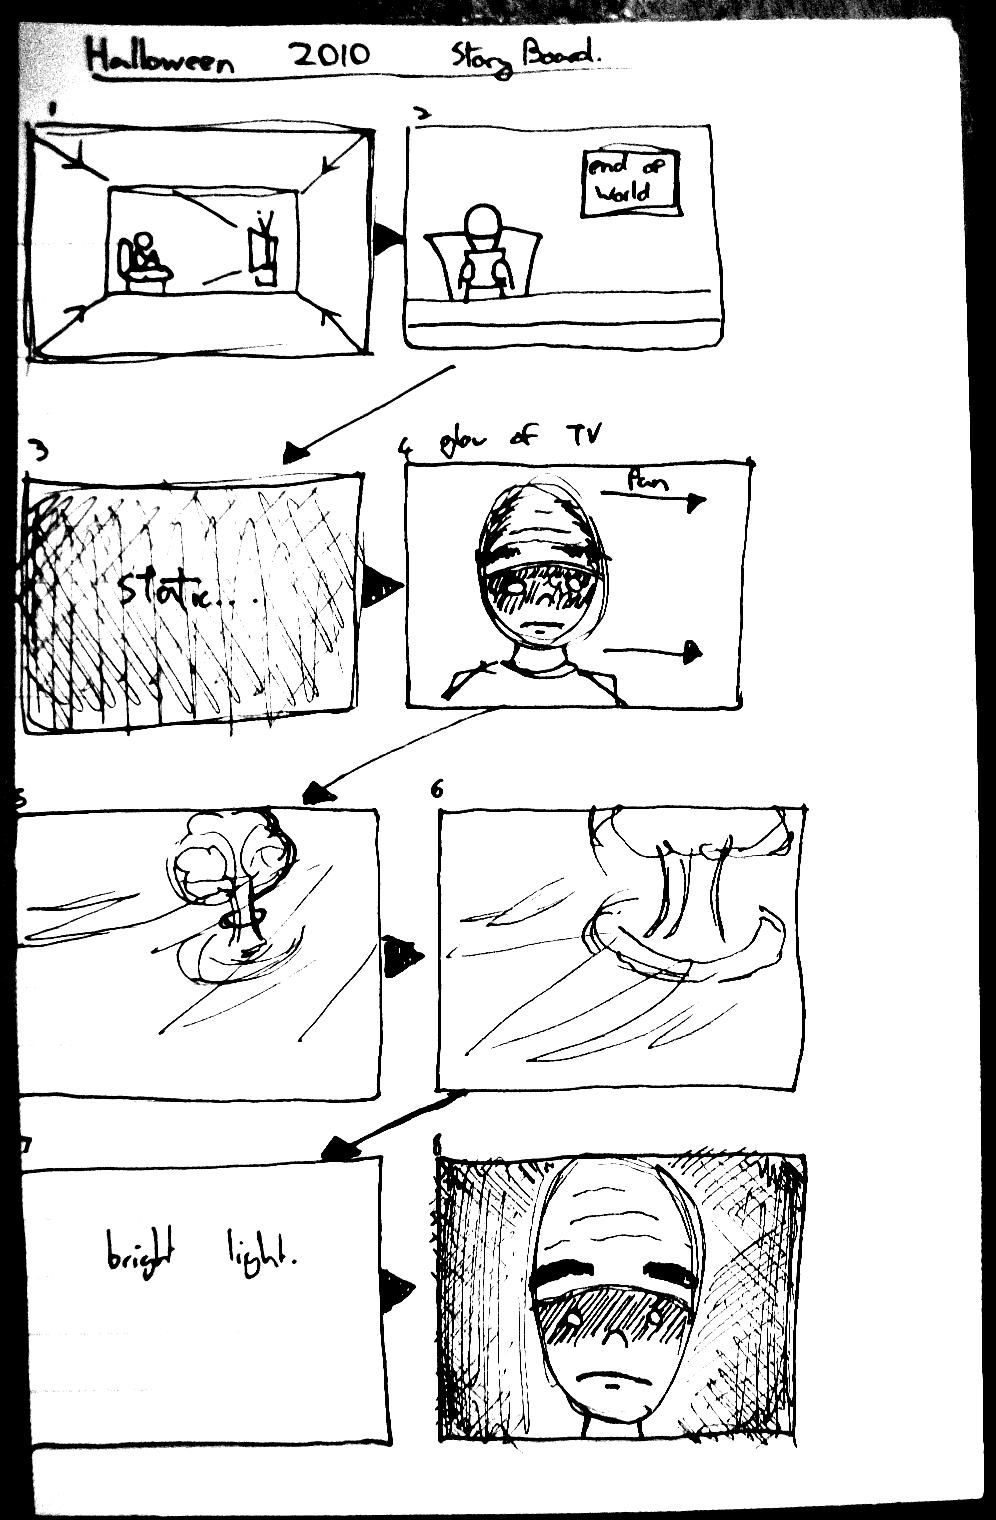 HALLOWEEN2010 Storyboards #01